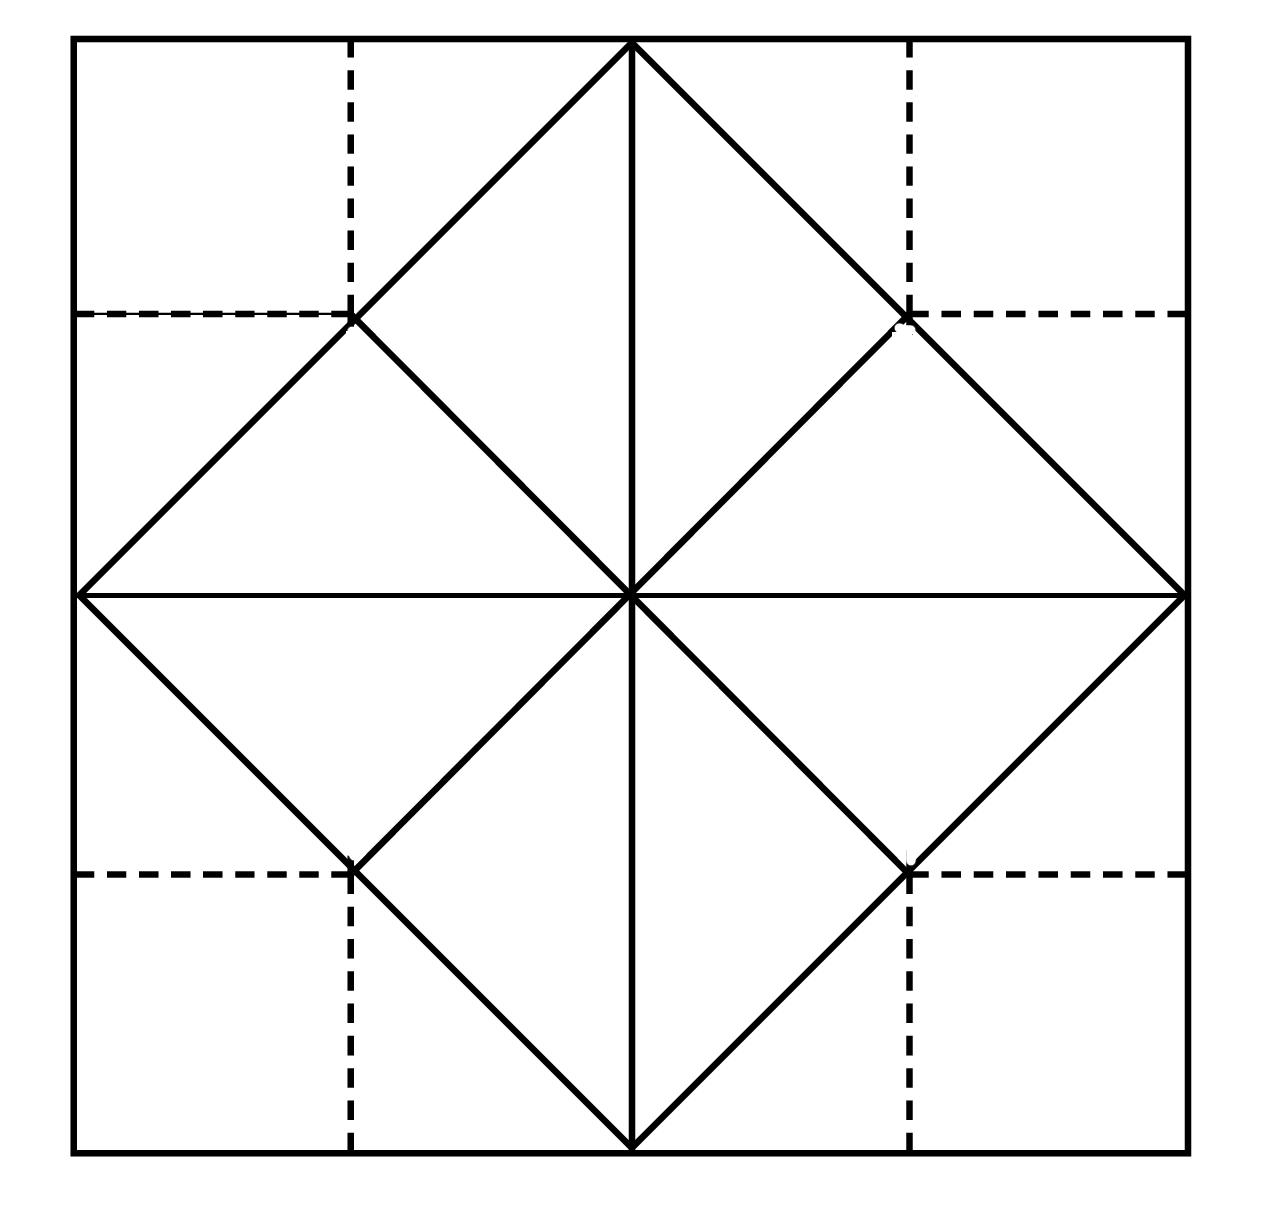 Prescribing DNA Origami Patterns via Scaffold Decoration - Zhang ... | 1226x1275